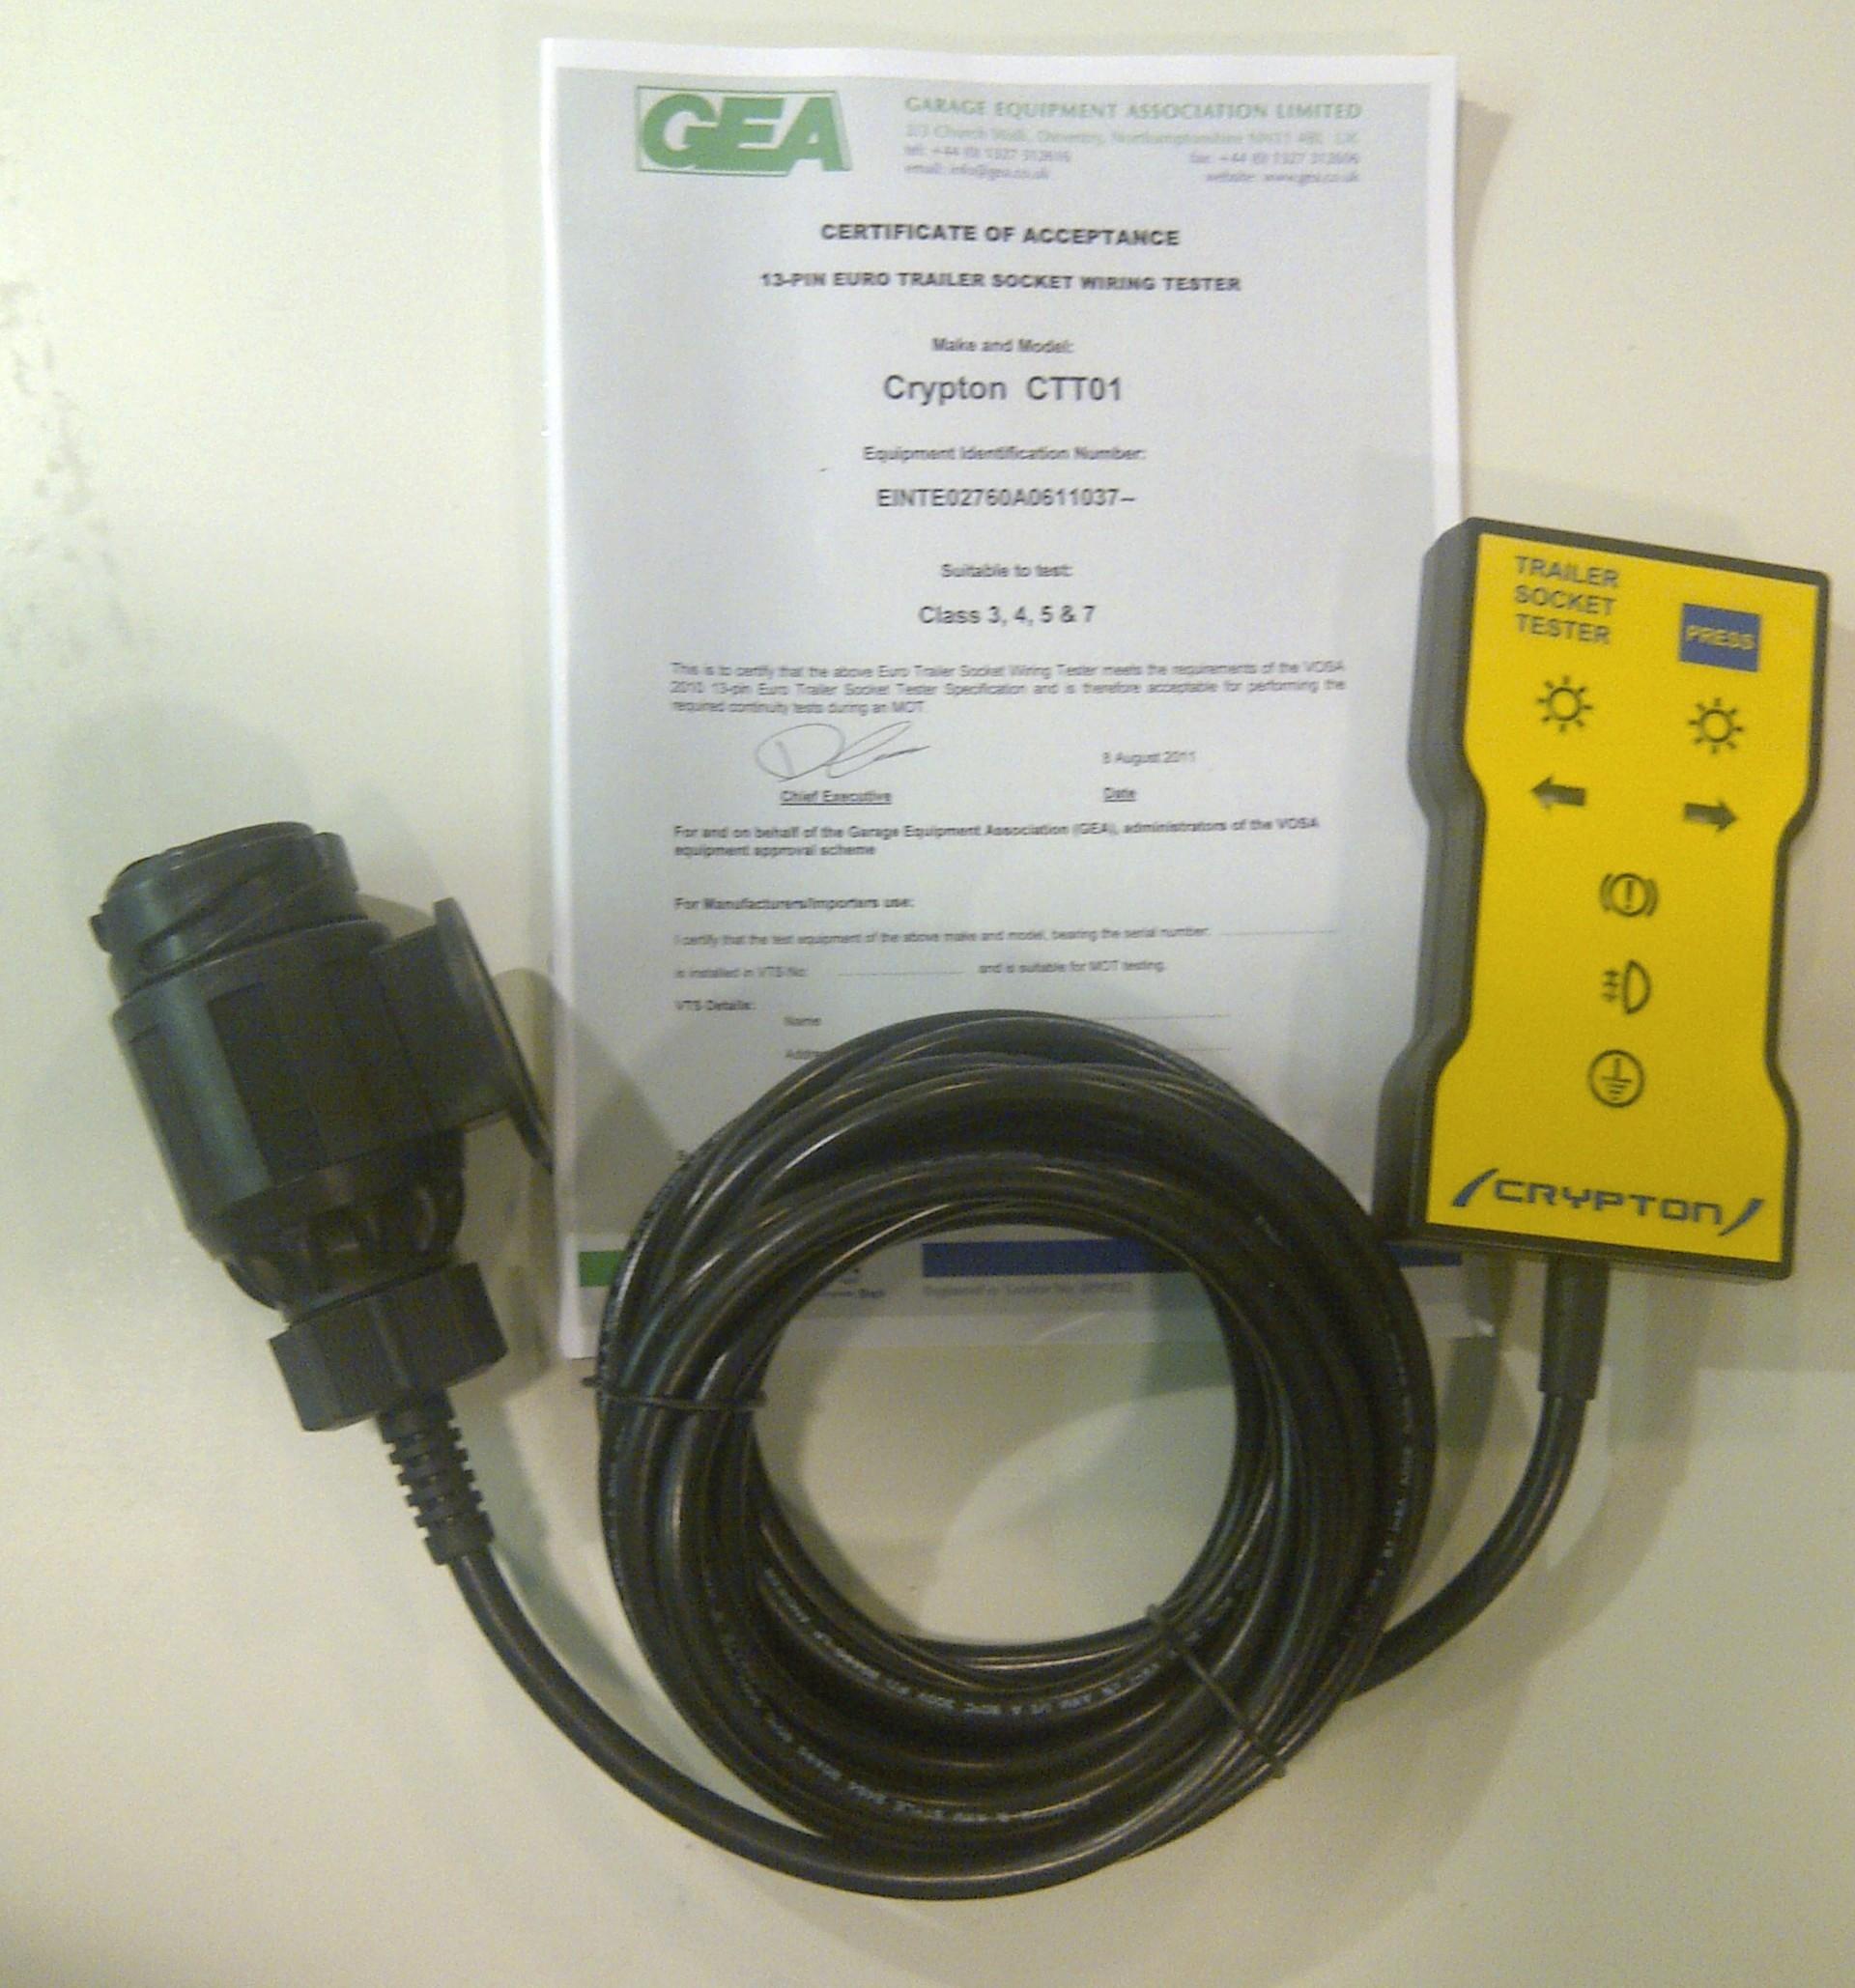 * AUDI A4 B8 A5 VEHICLE TRACKING CONTROL MODULE 8K0907440A